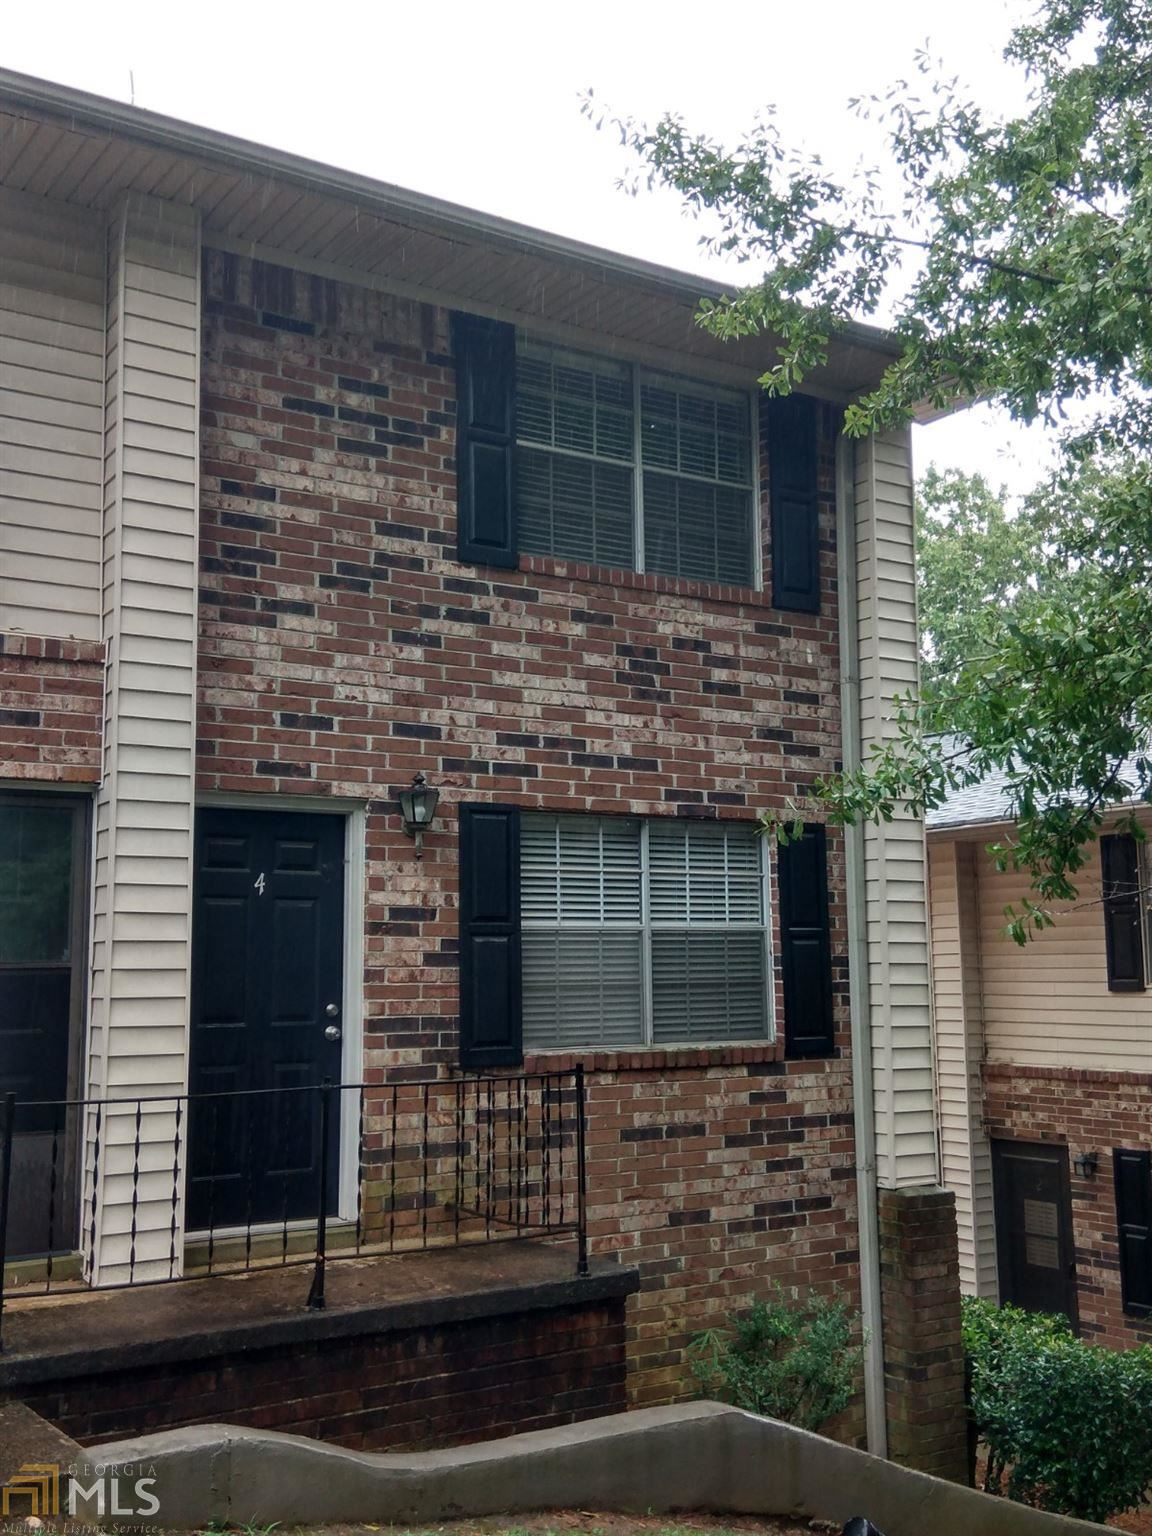 1235 Riverside Dr, Gainesville, GA 30501 - #: 8844222